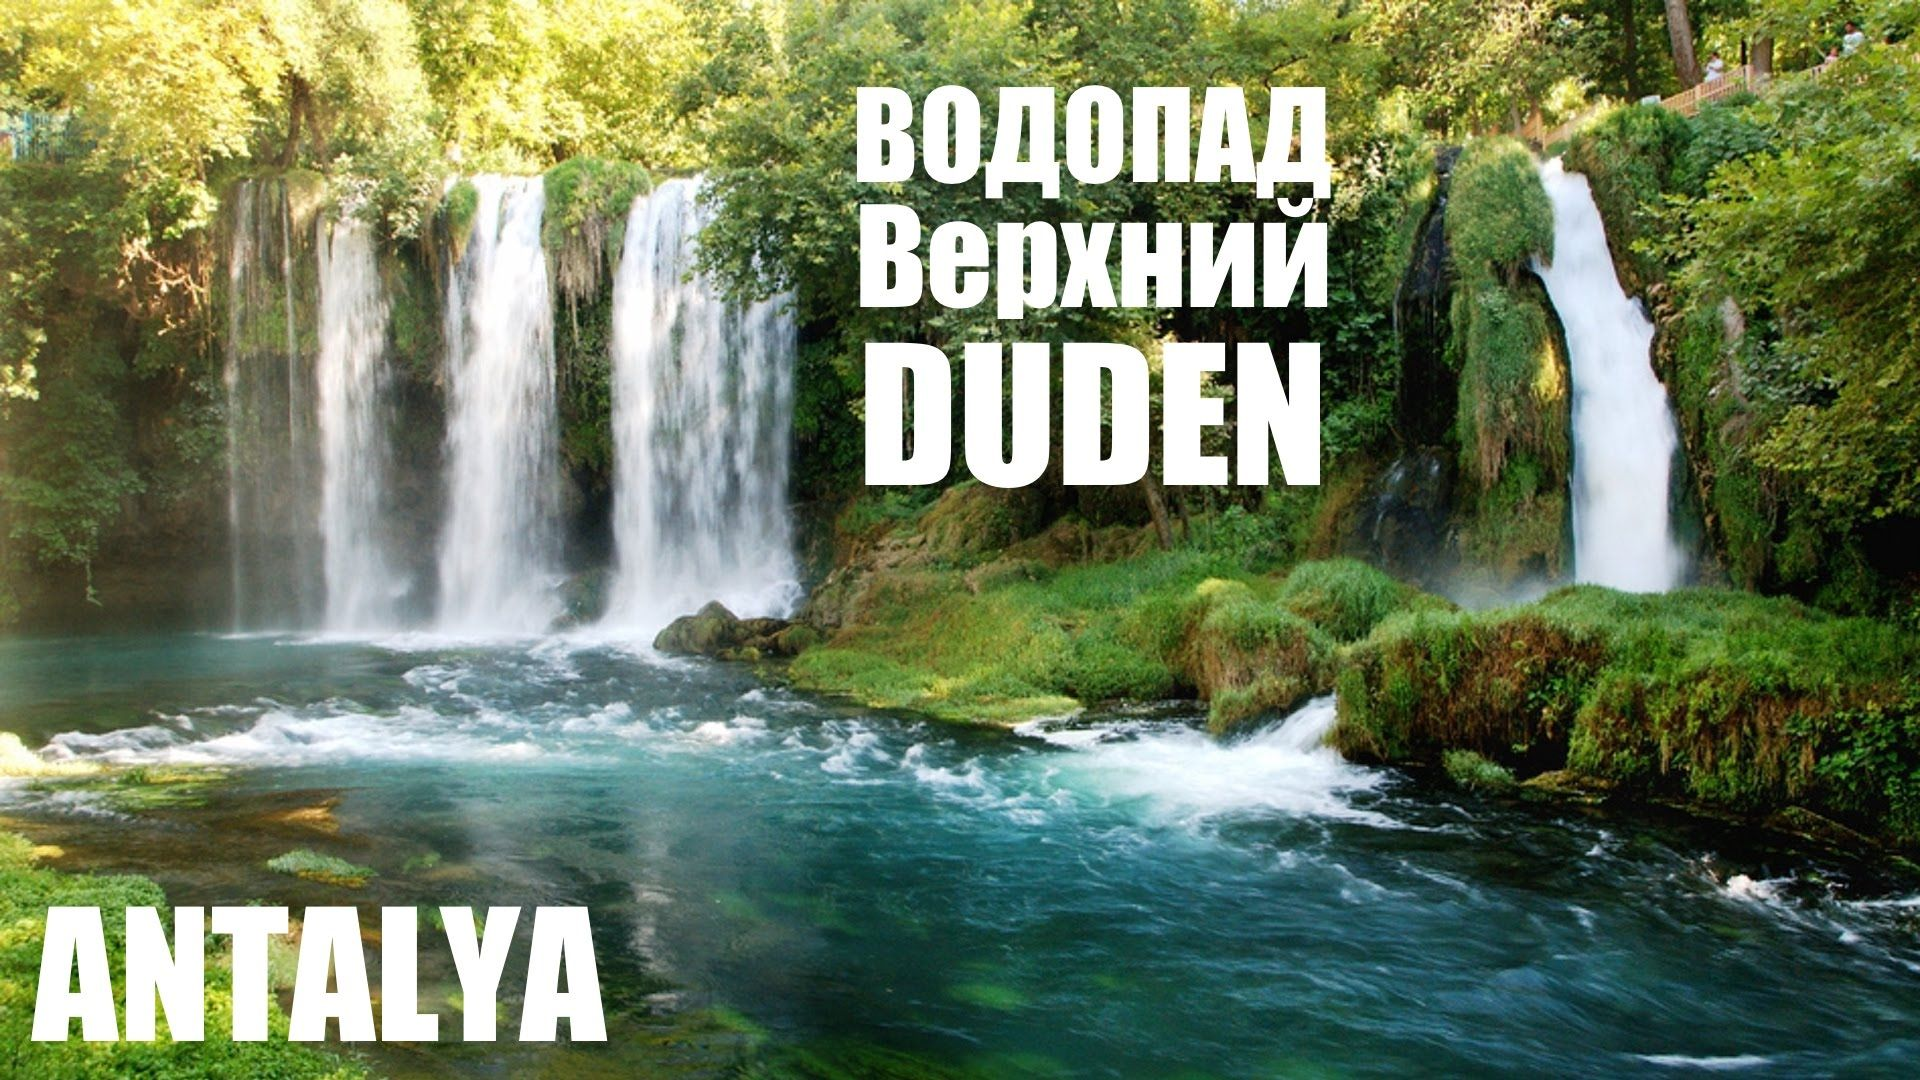 Водопад Верхний Дюден = Yukarı Düden Şelalesi = Duden